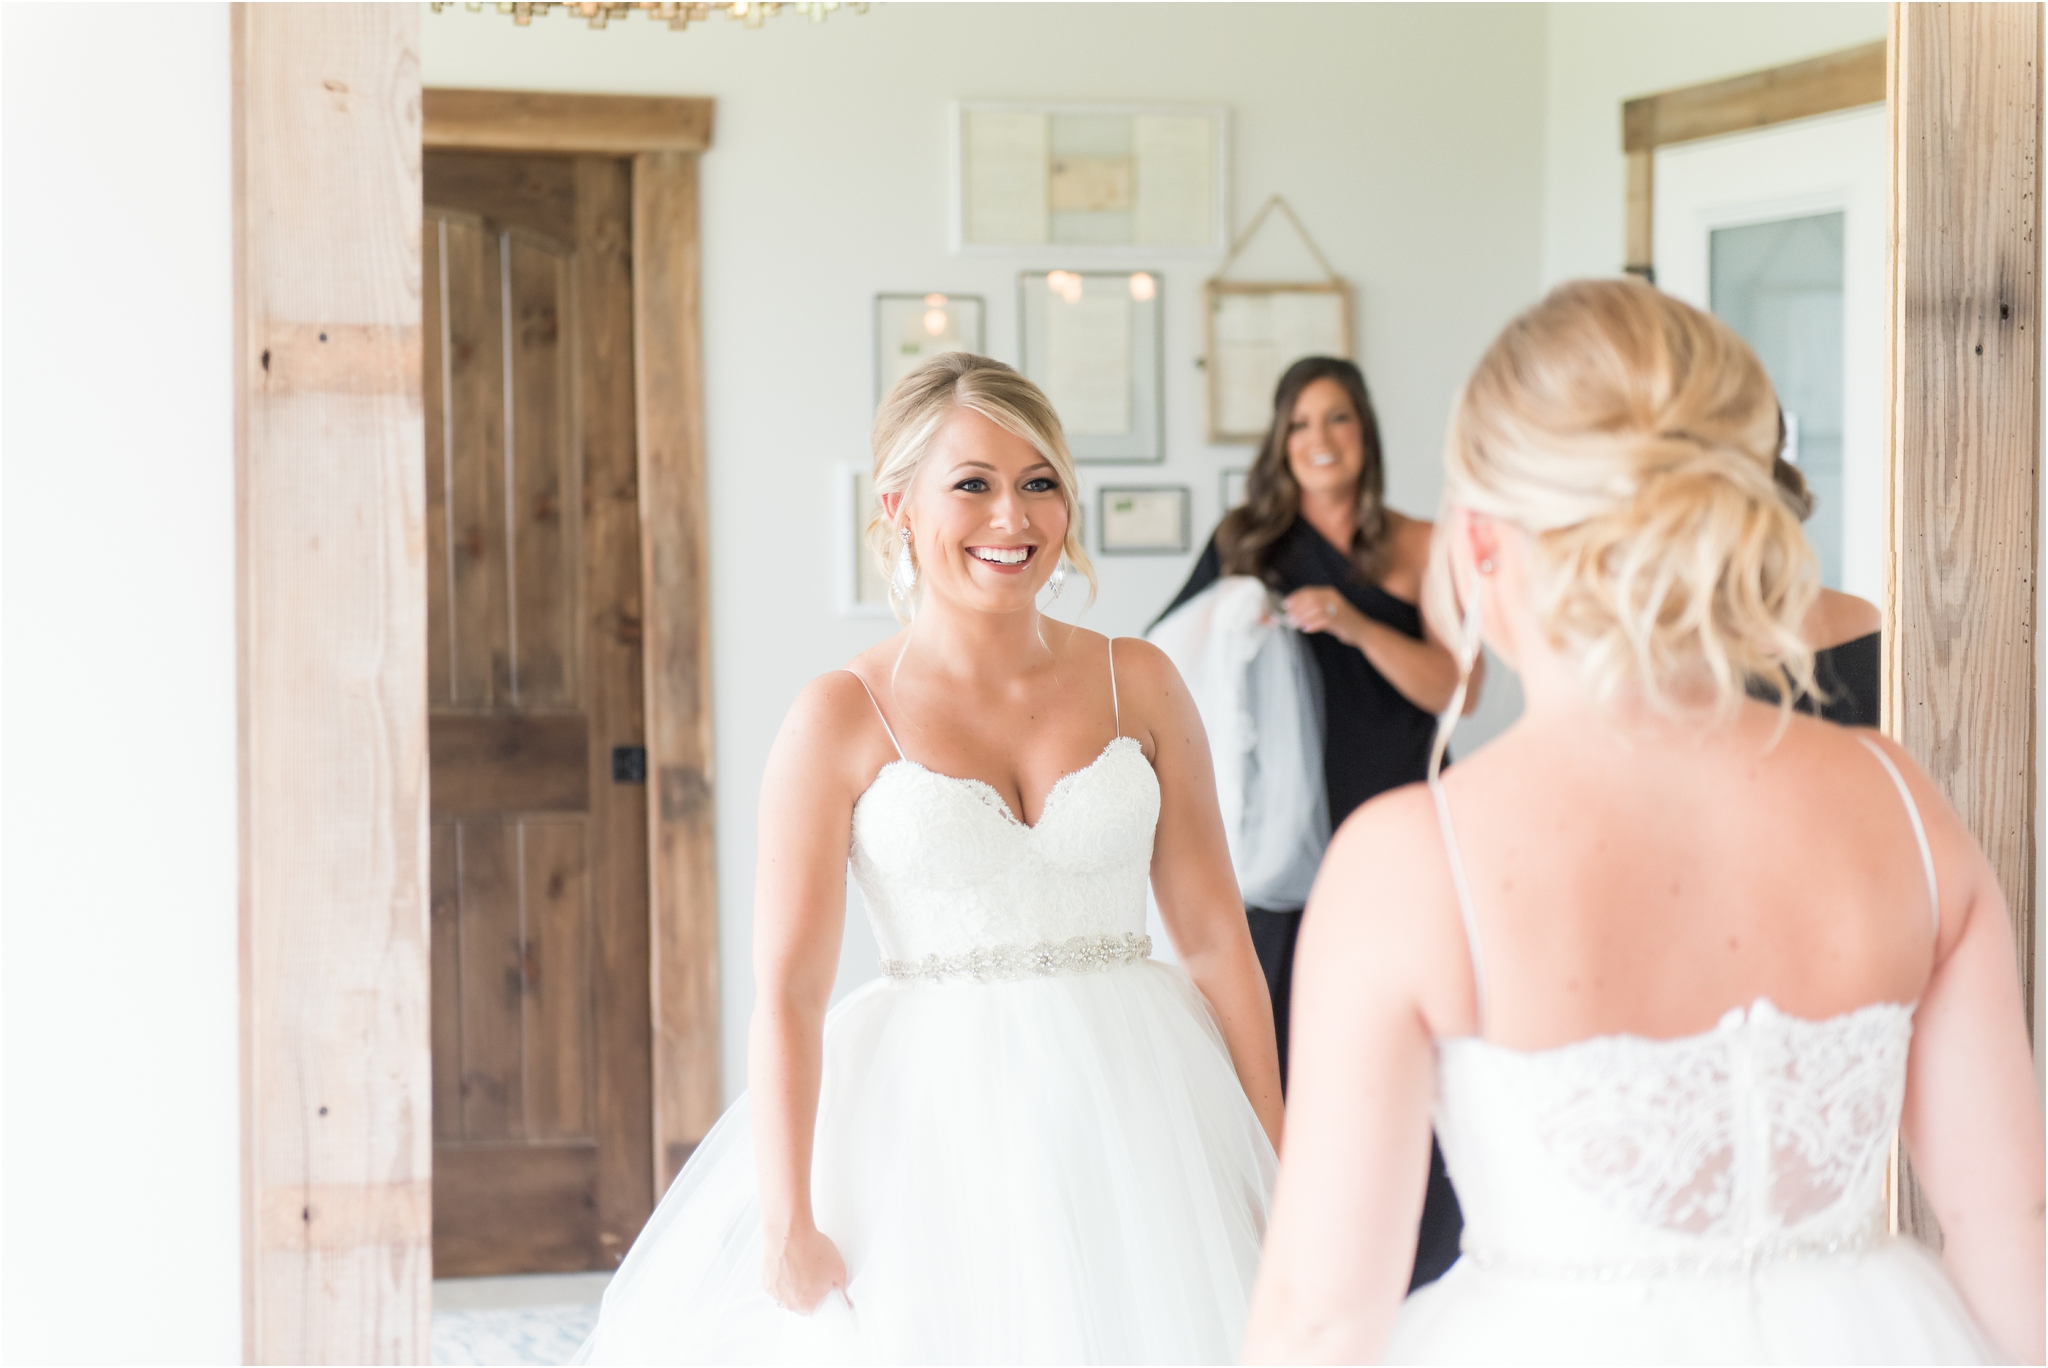 Zoee Amp Patrick The Barn On Boundary Wedding Eaton IN